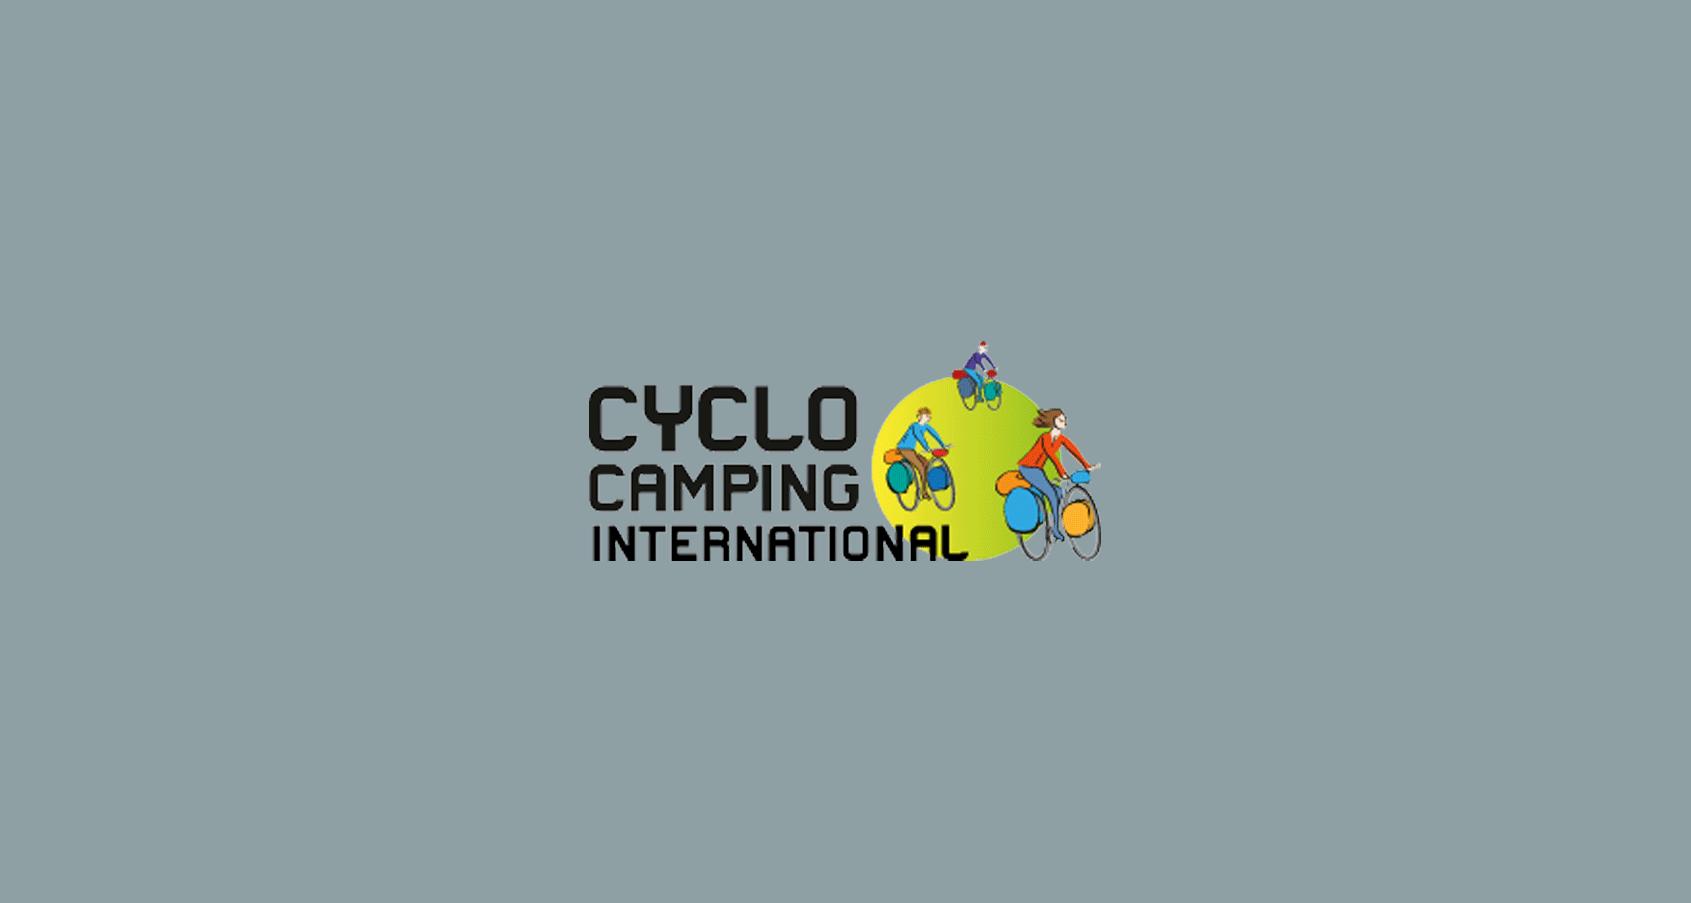 Cyclocamping Internationnal